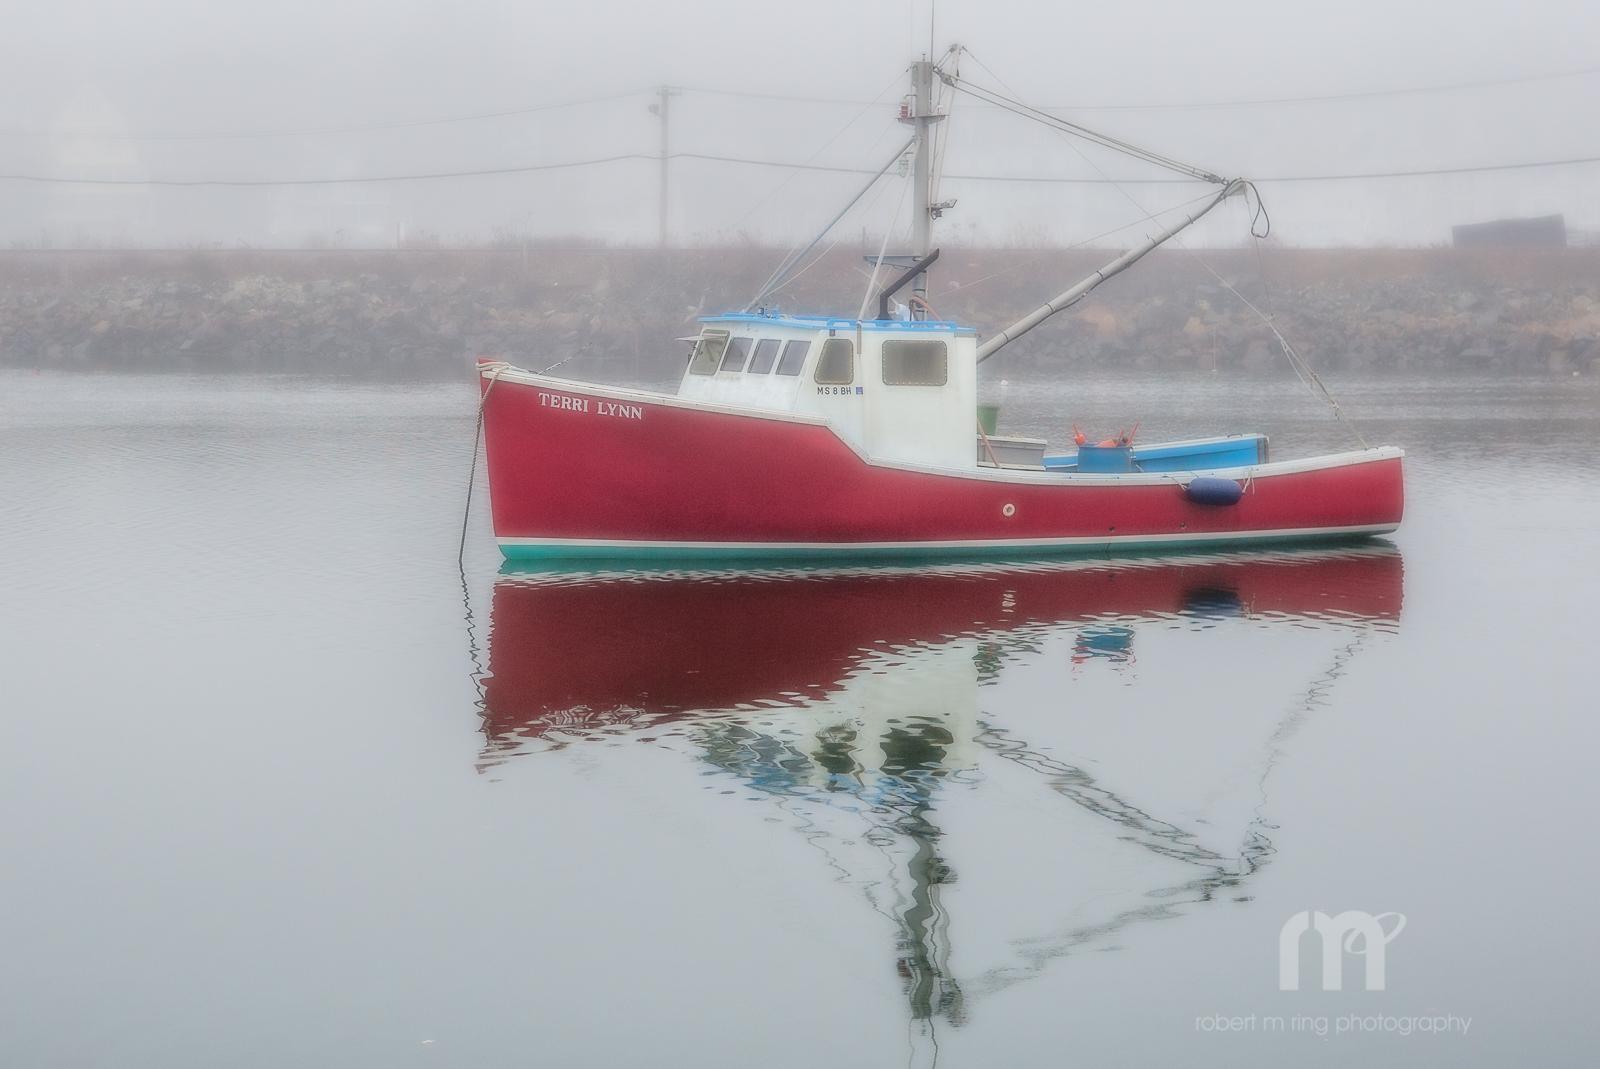 Fog, photo